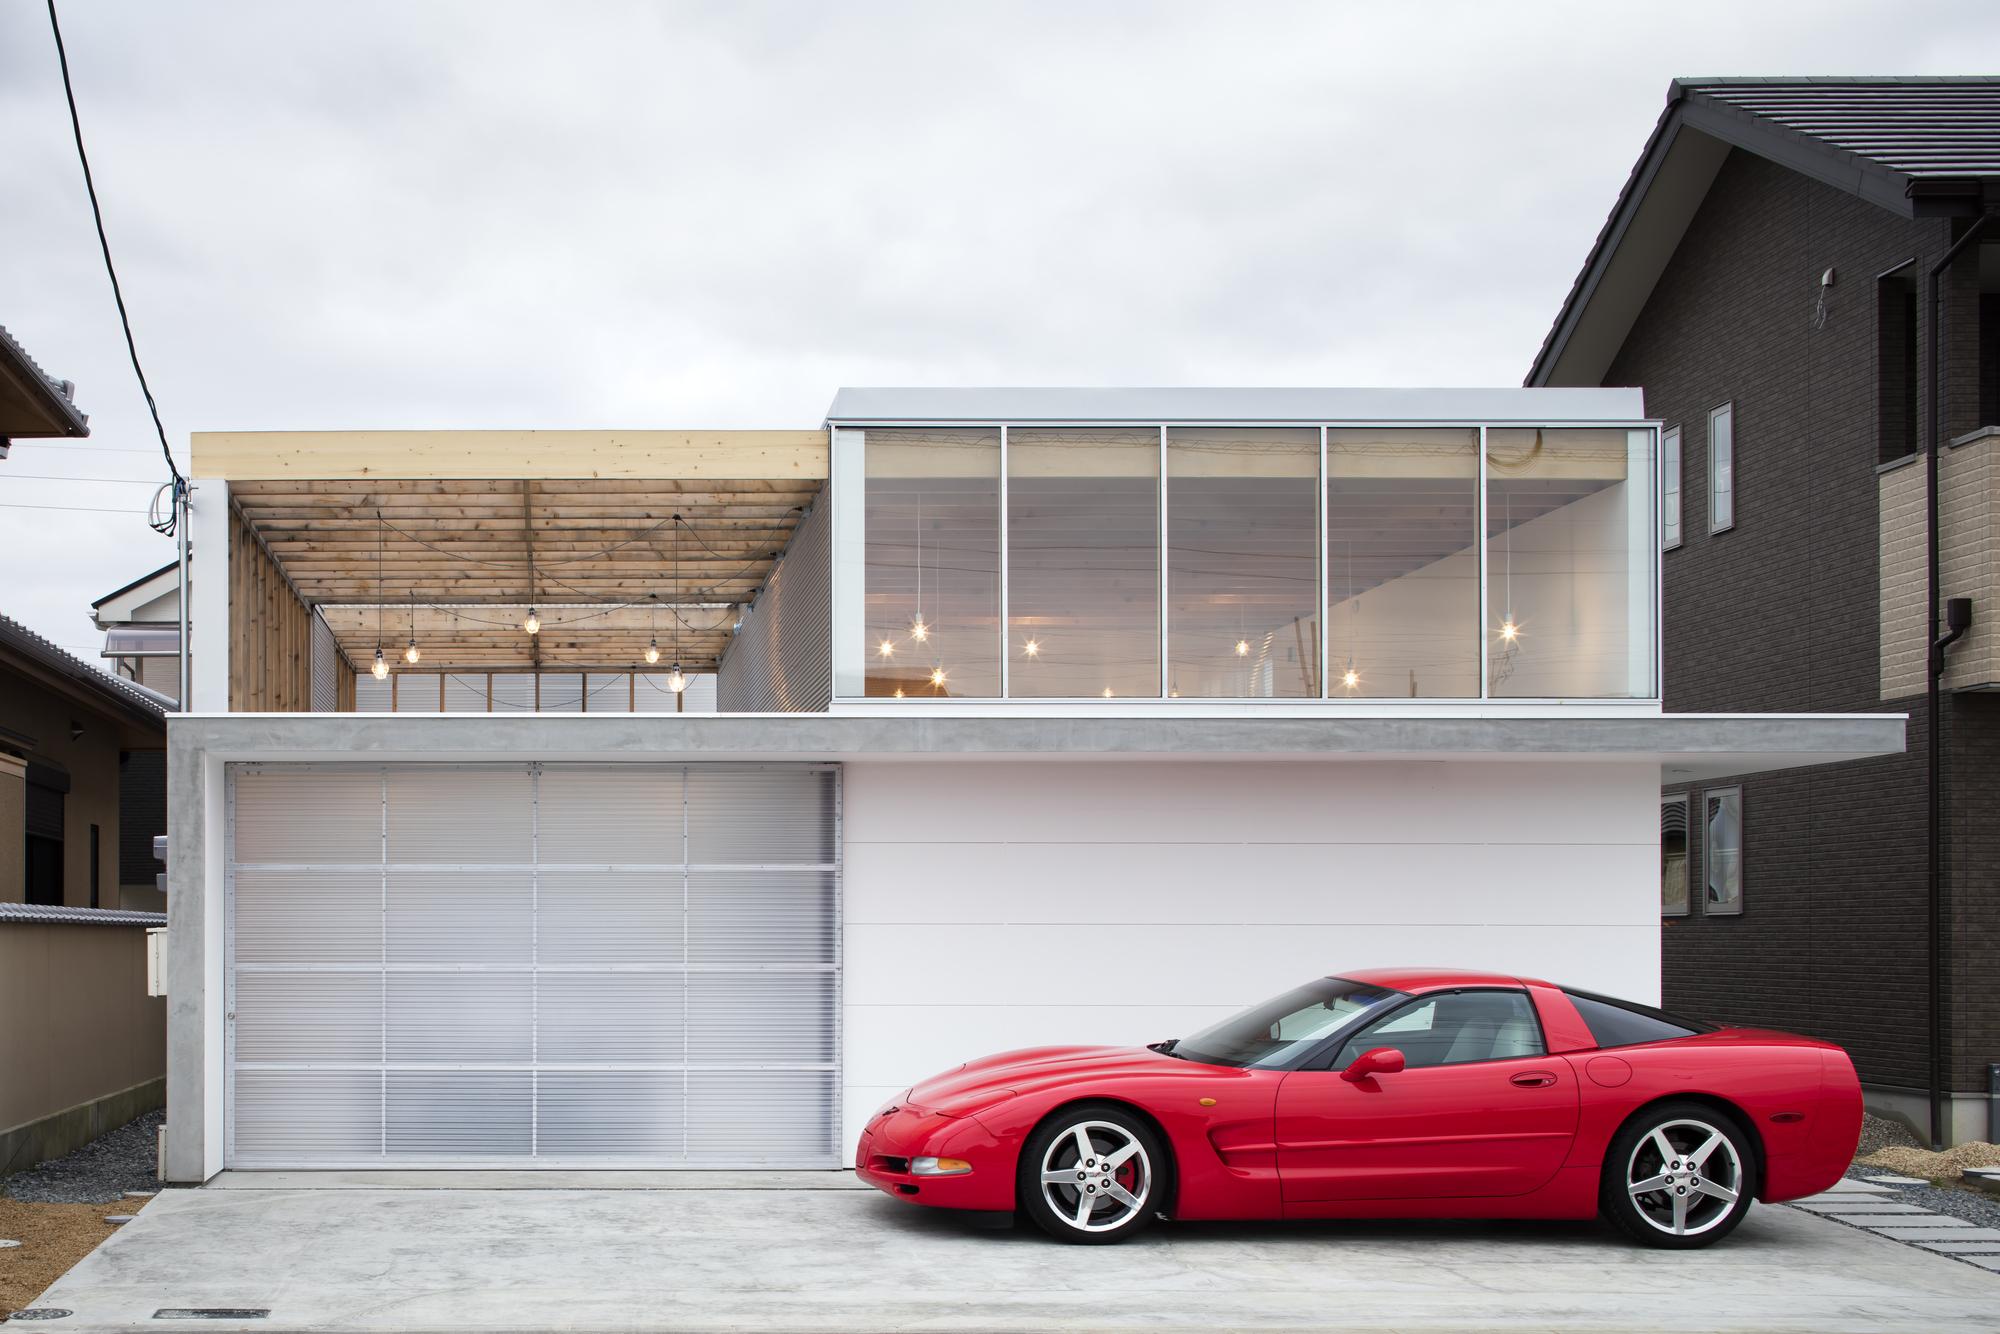 Garage Terrace House Yoshiarchitects Archdaily